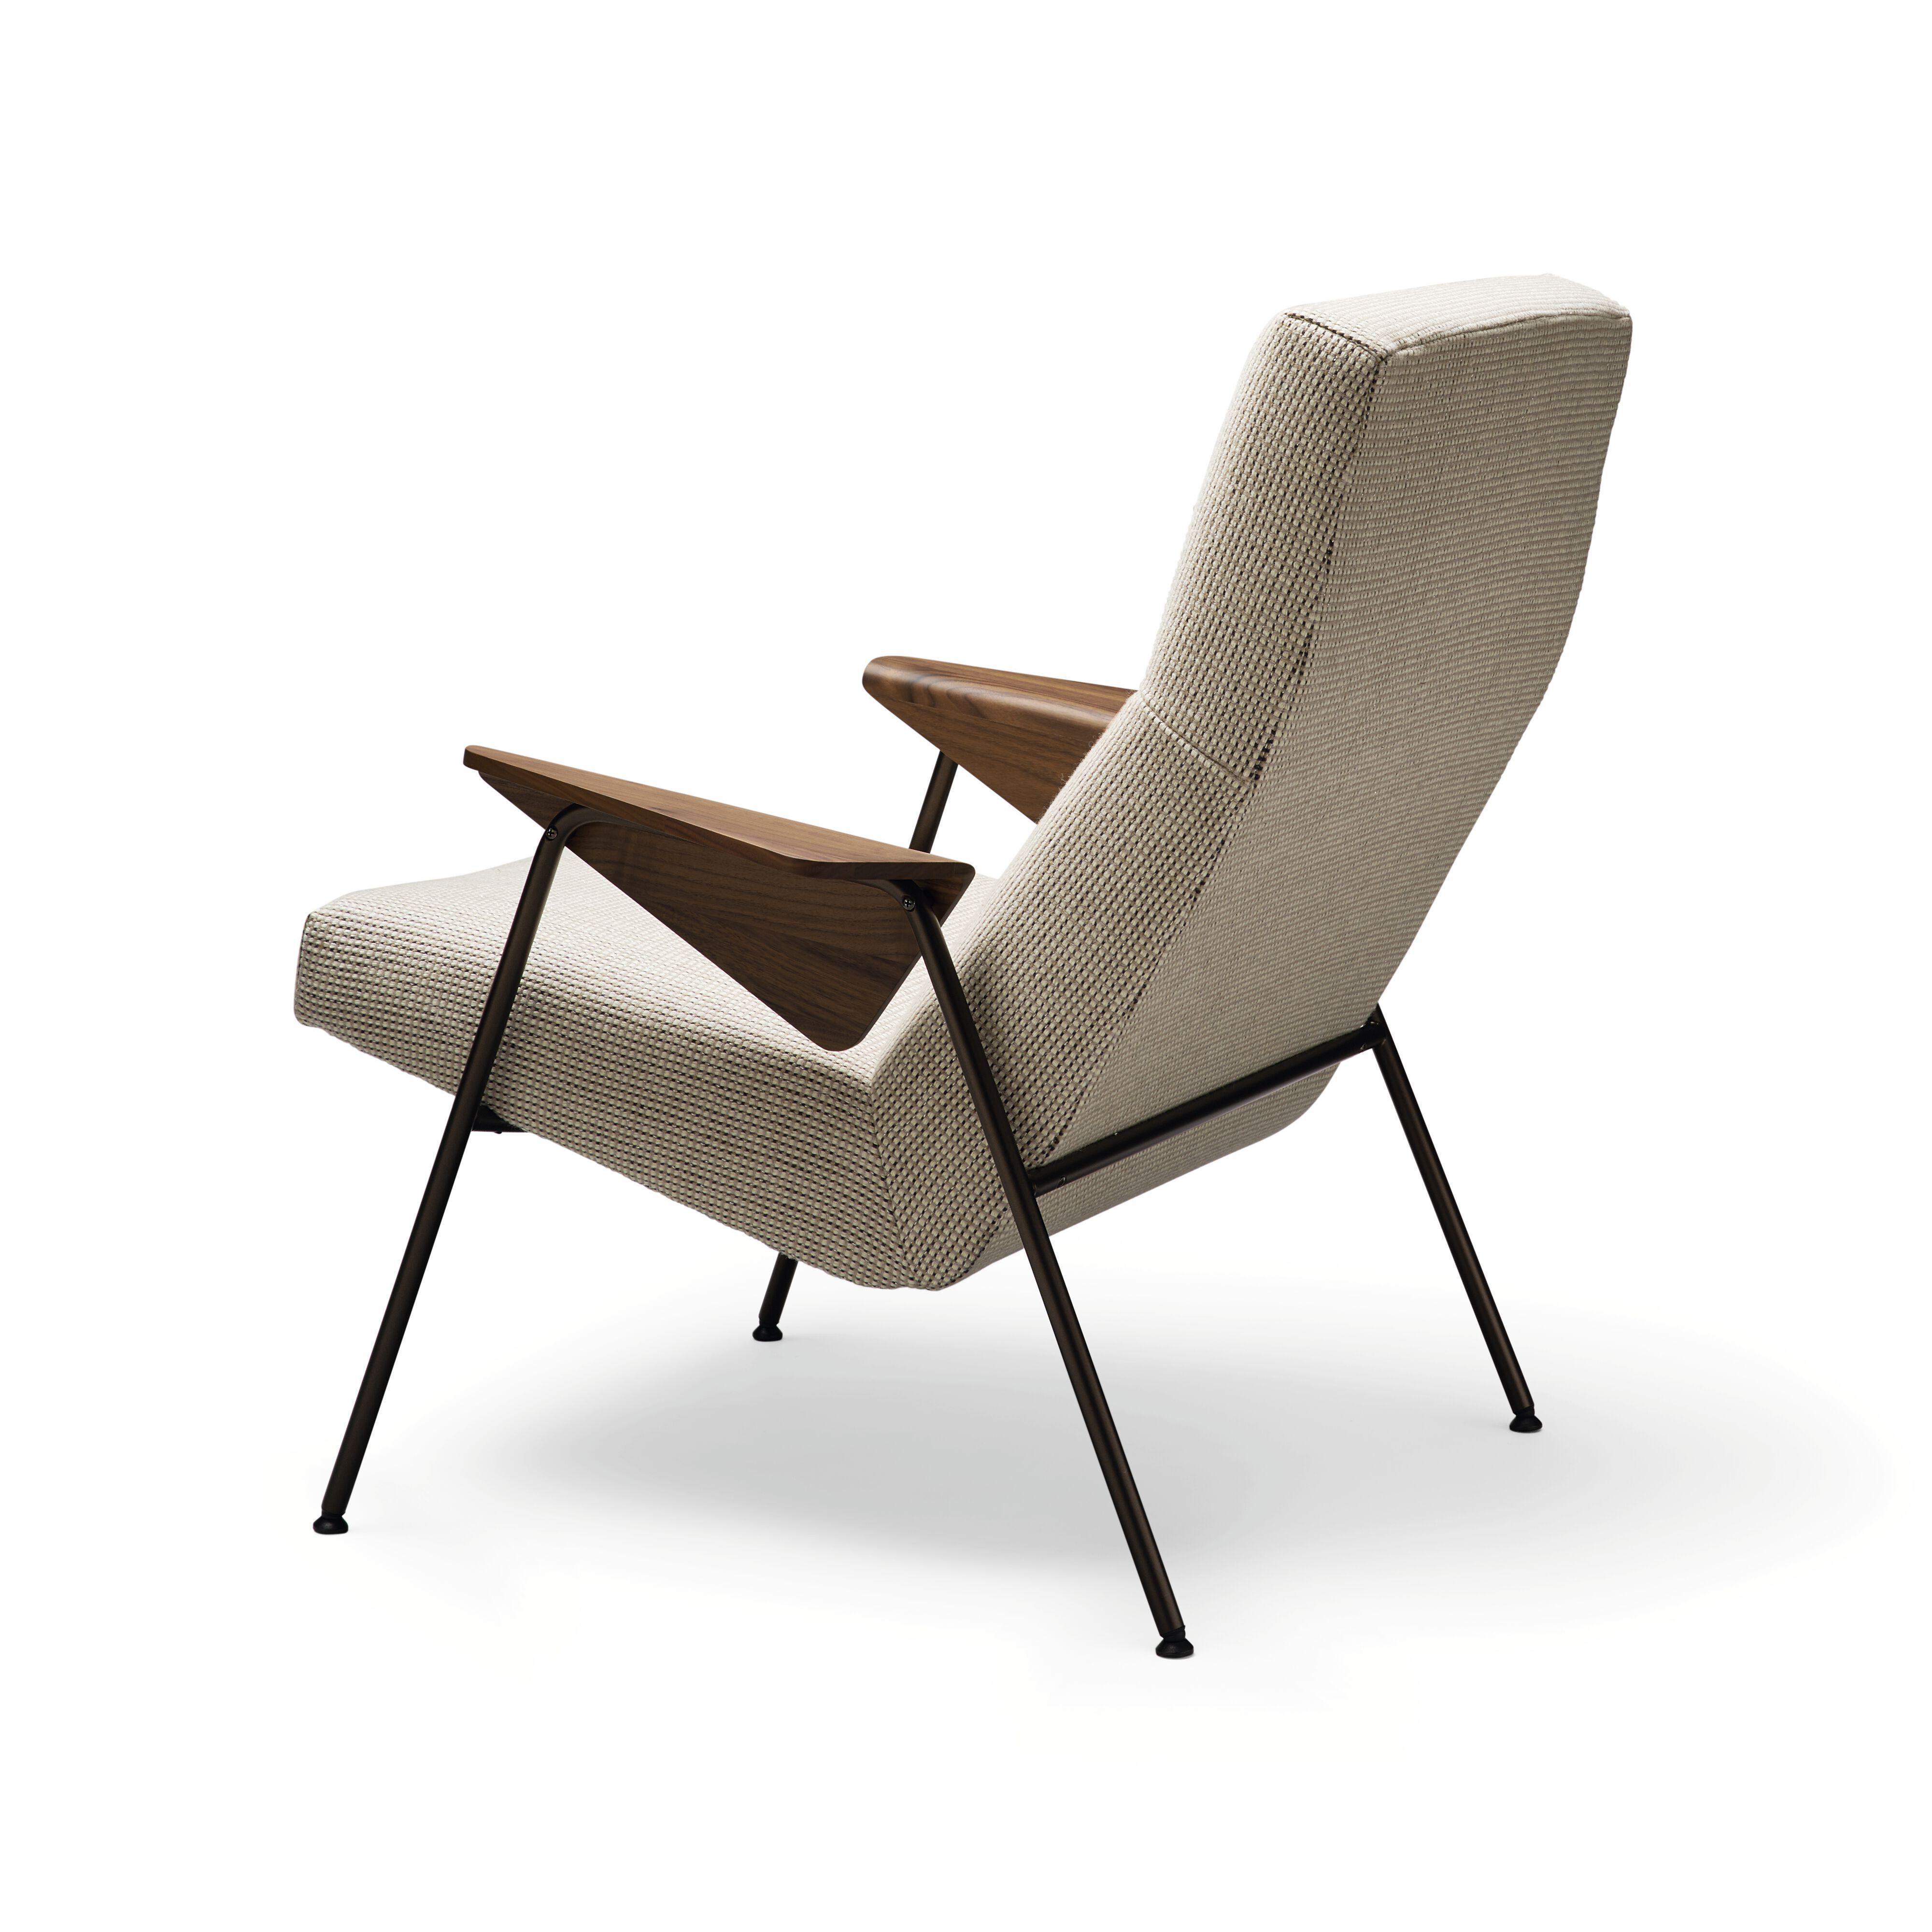 07-WK-Classic_Edition-Votteler_Chair-0012-H.tif